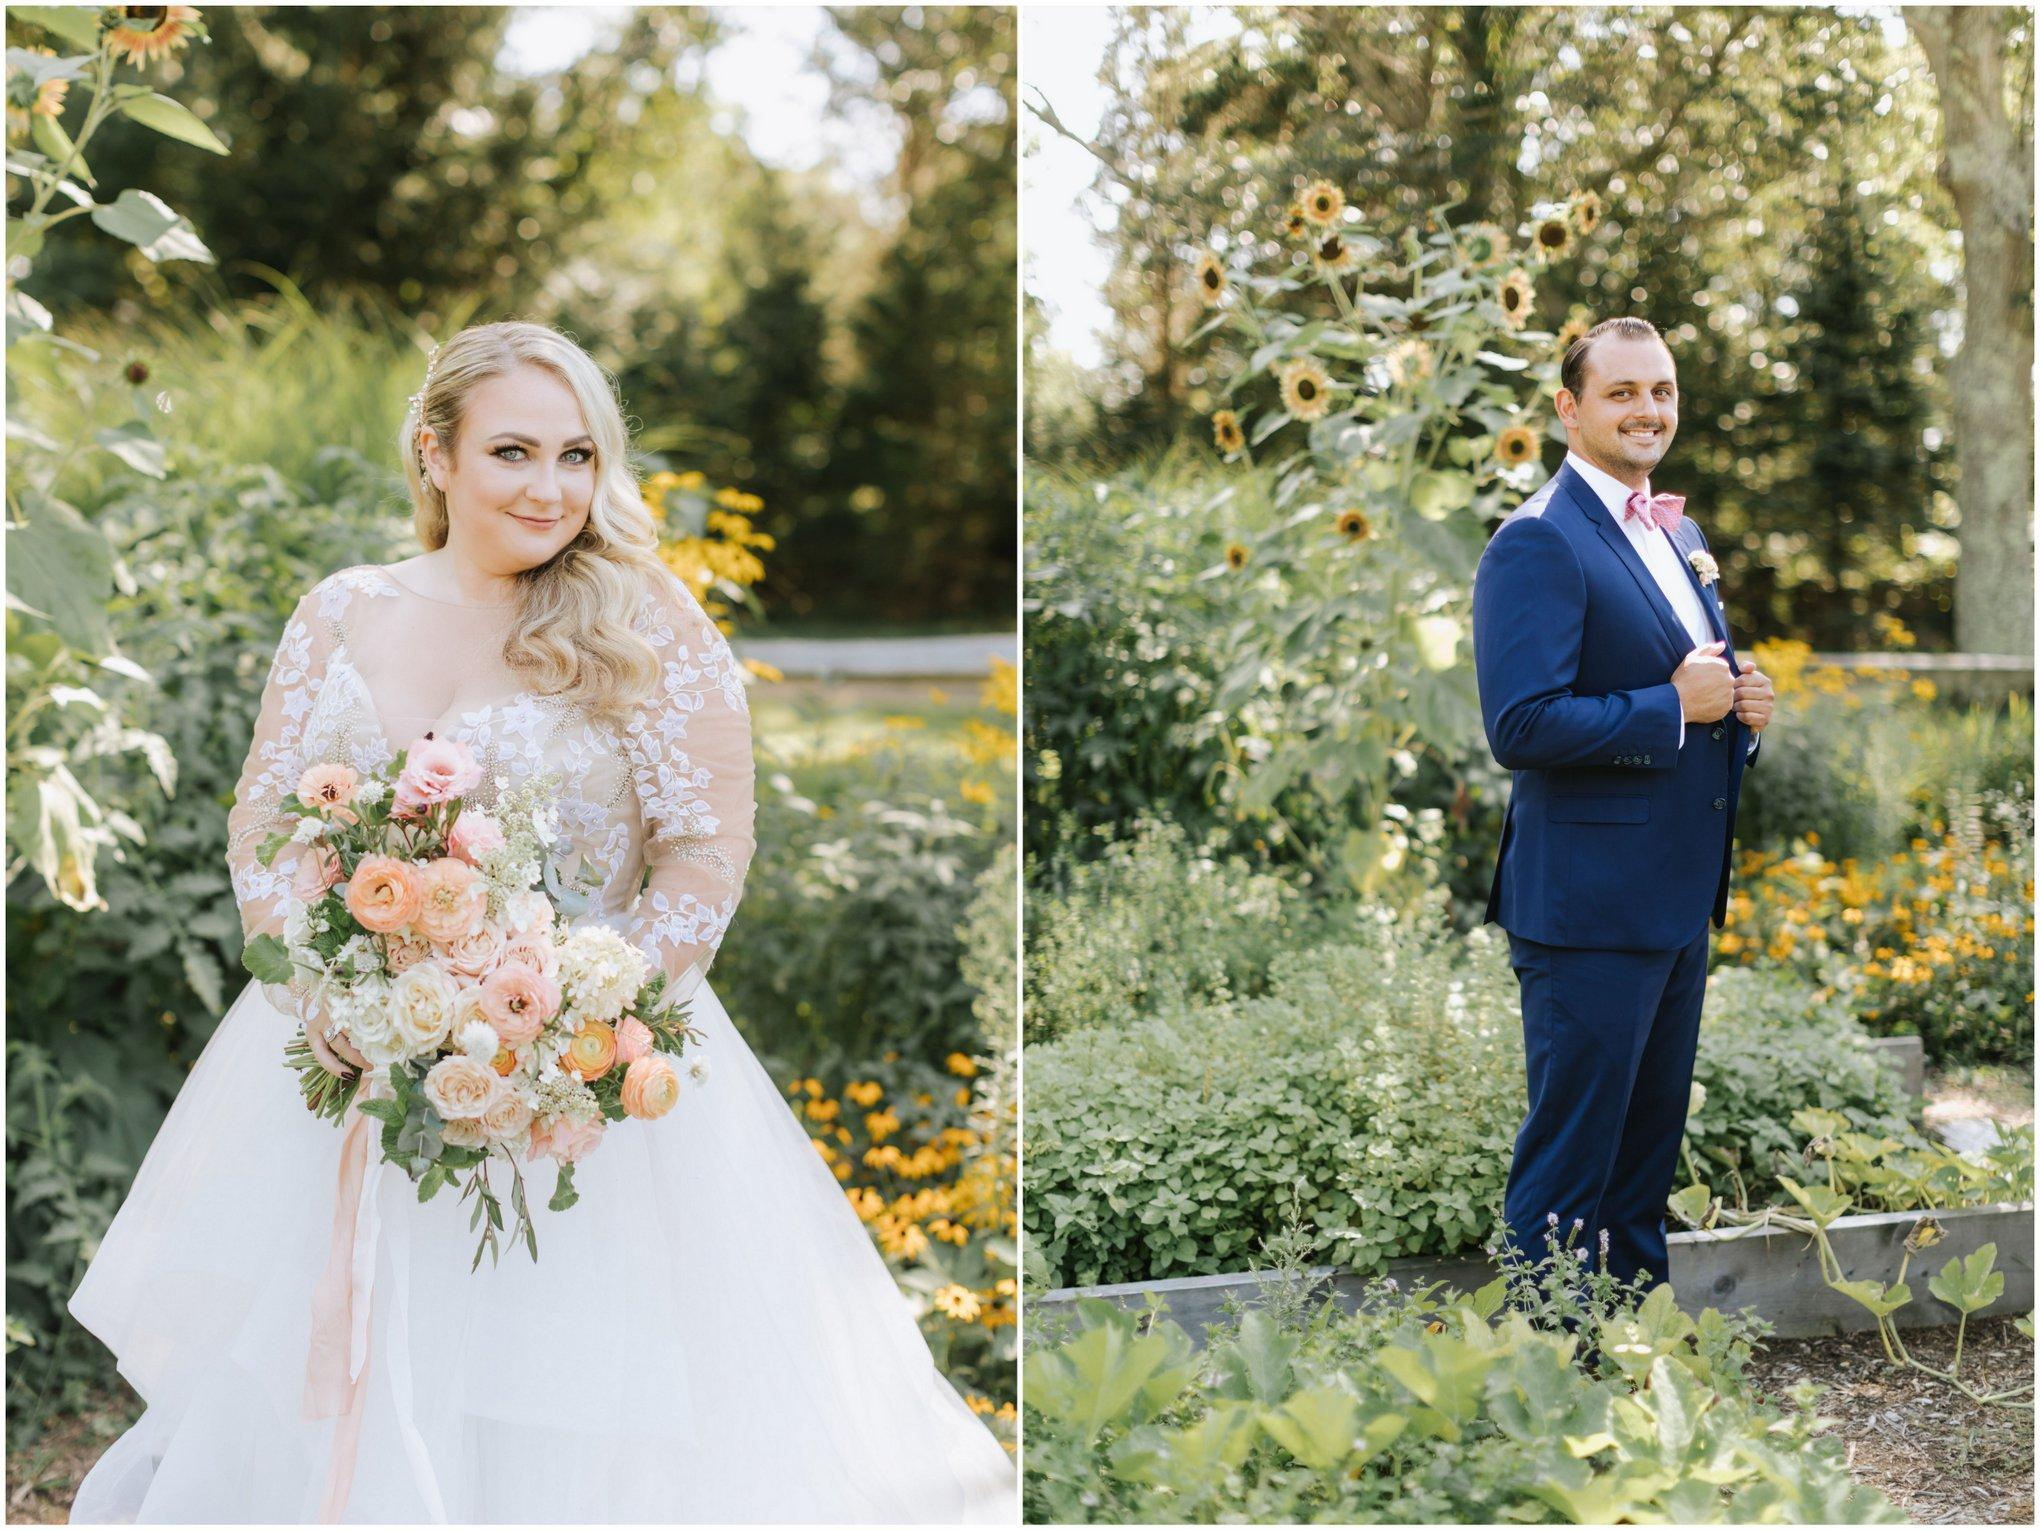 Marthas-Vineyard-Wedding-Photographer-Beach-Plum-Inn-12.jpg